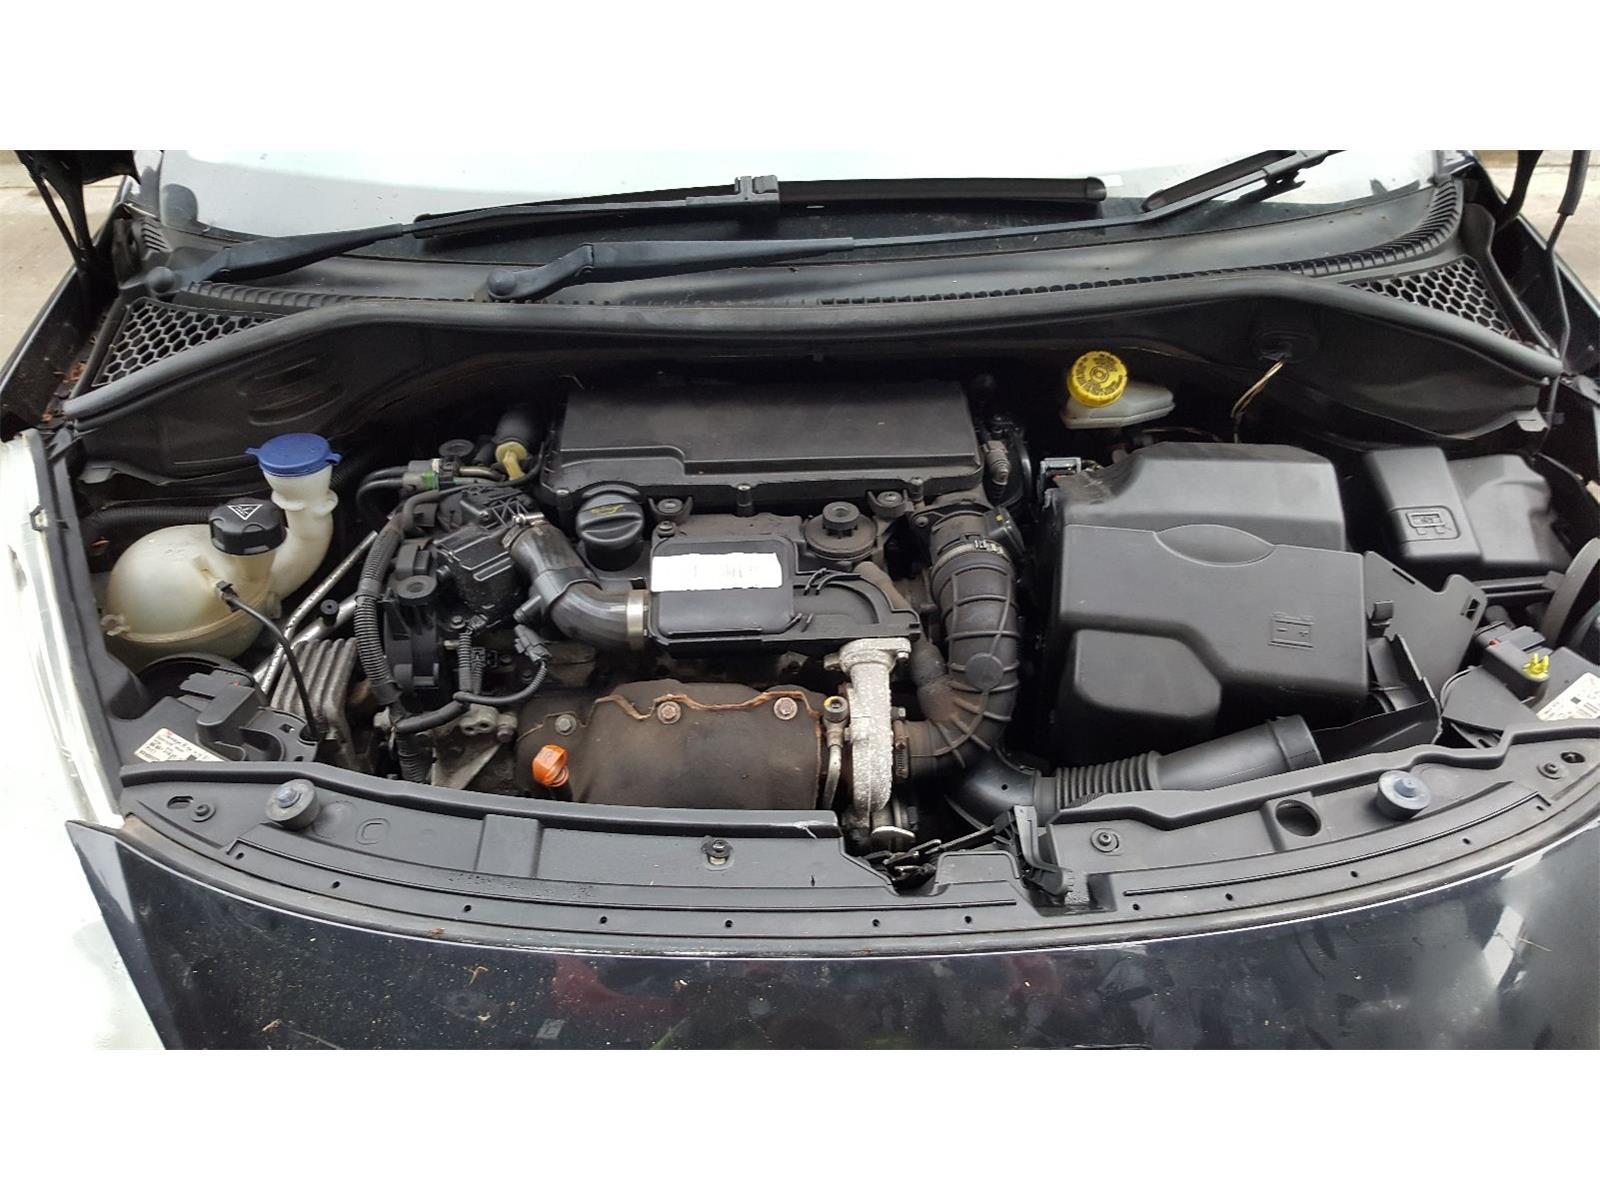 Peugeot 207 2006 To 2009 S A C Hdi 3 Door Hatchback Scrap Under Bonnet Fuse Box Year